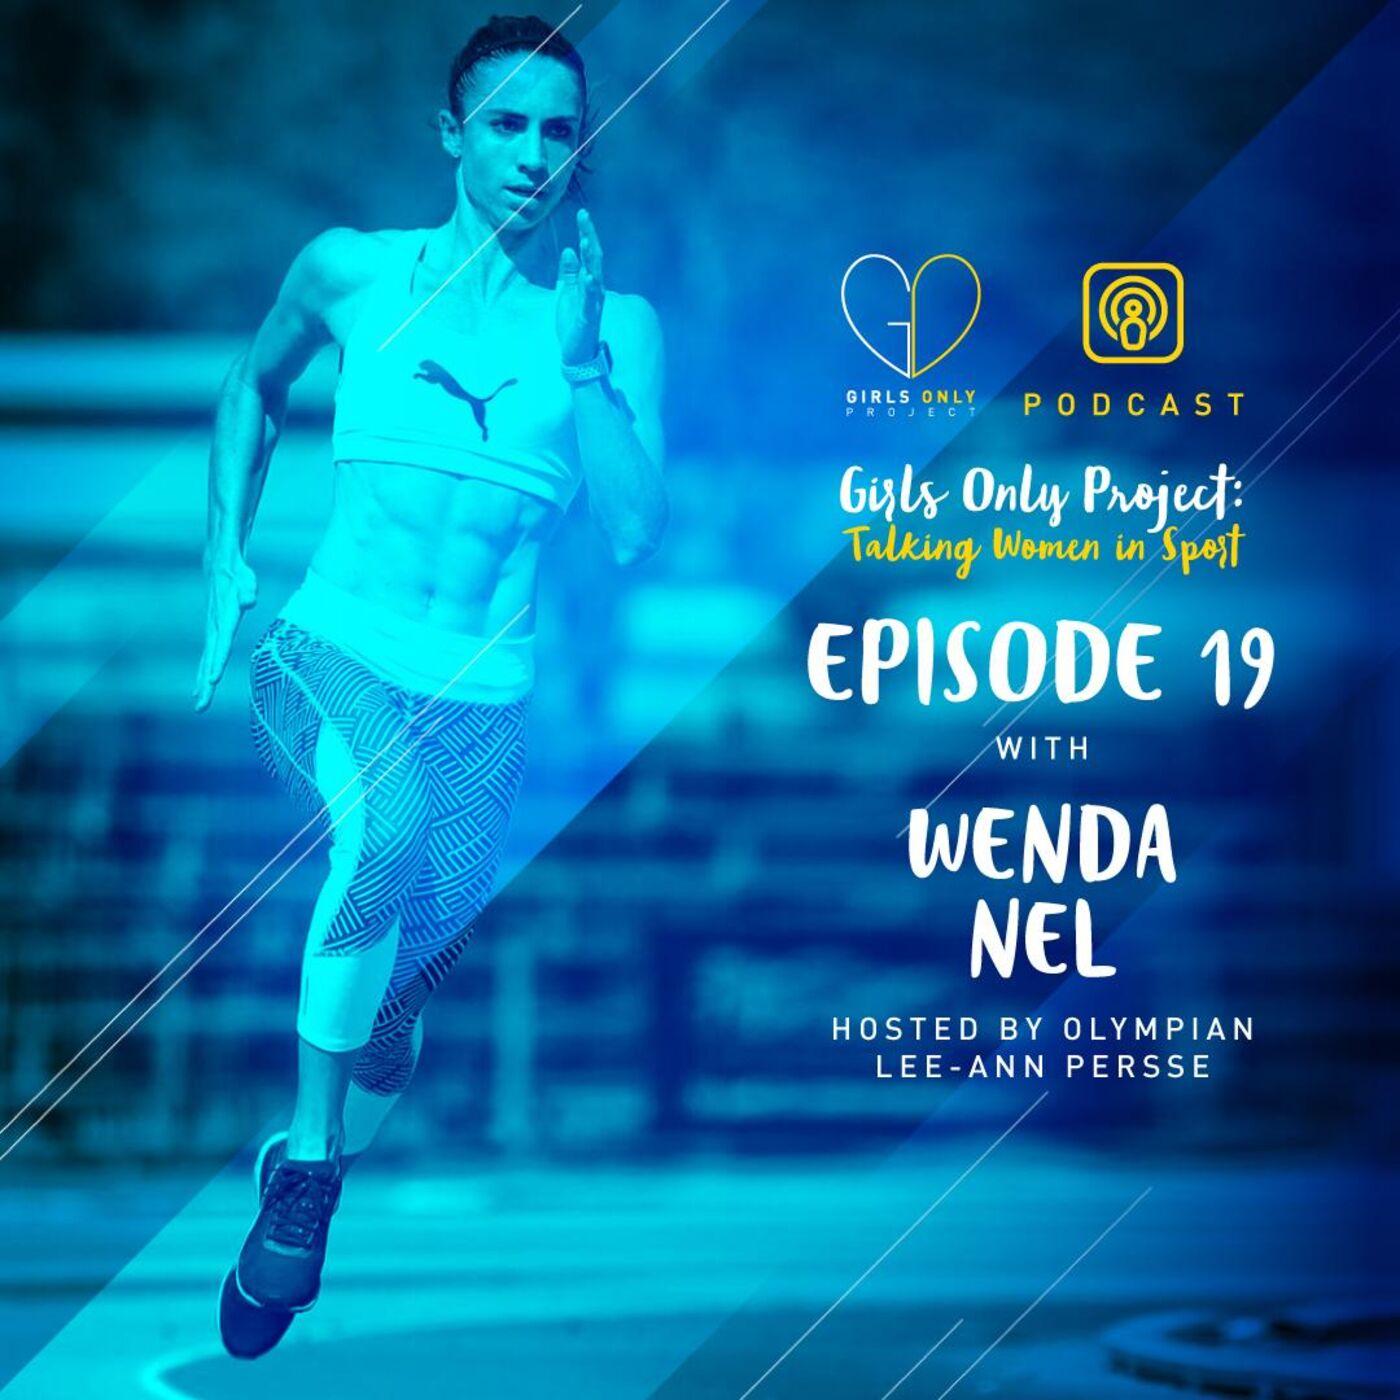 Wenda Nel